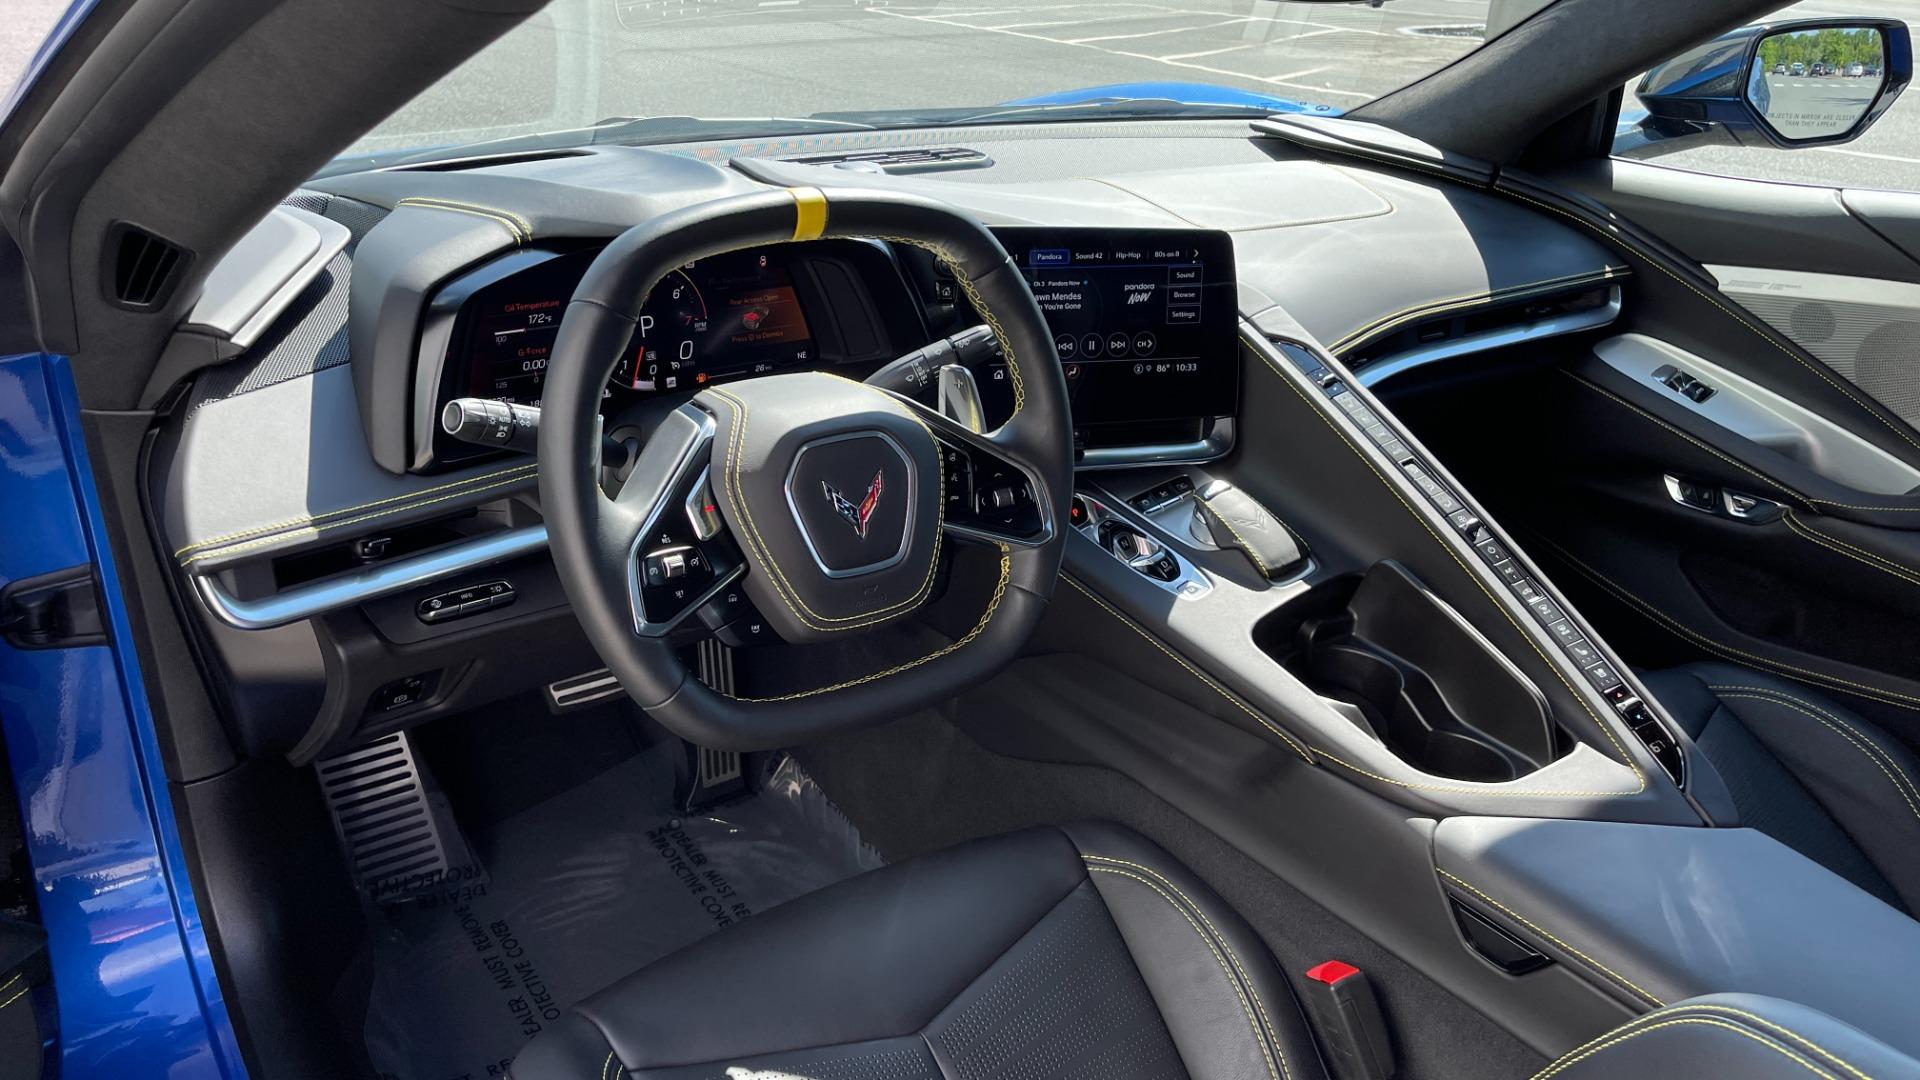 Used 2021 Chevrolet CORVETTE STINGRAY 3LT COUPE / 8-SPD / PERF PKG / NAV / BOSE / REARVIEW for sale $110,995 at Formula Imports in Charlotte NC 28227 6